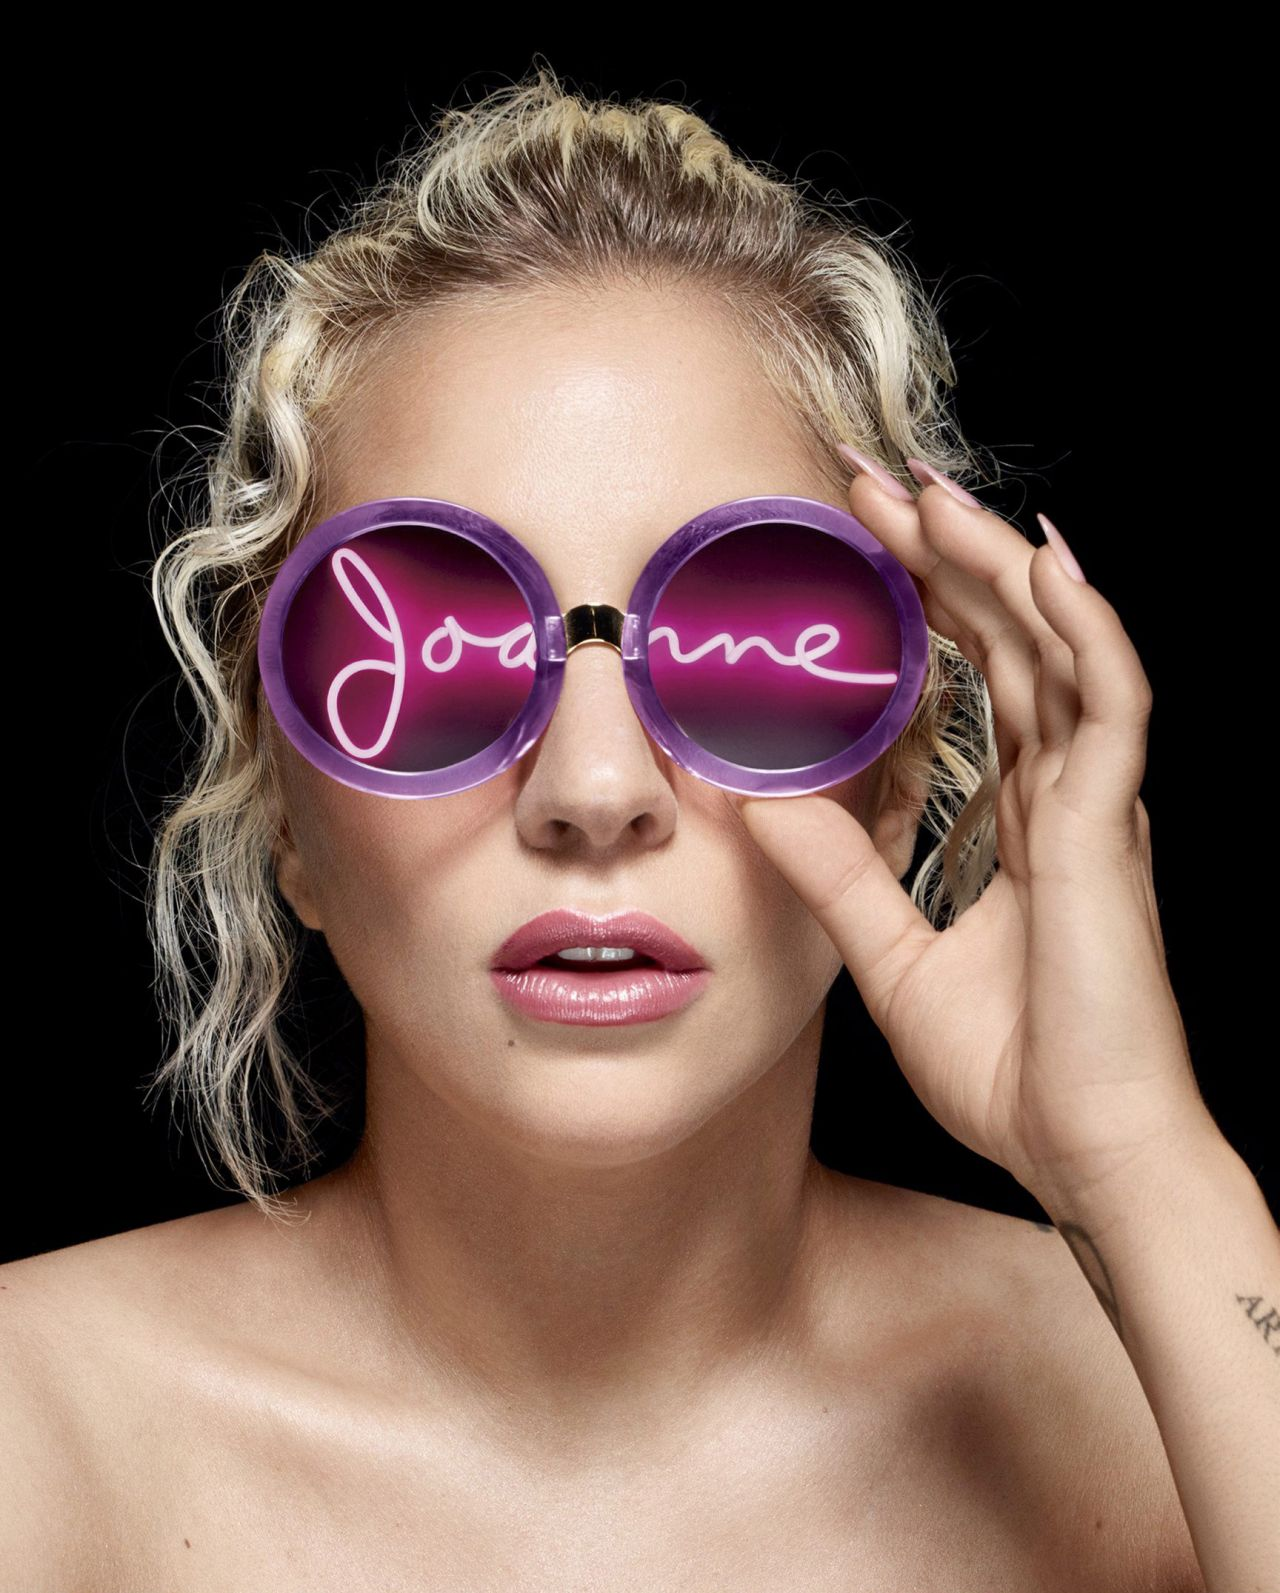 Lady Gaga - Photoshoot for Joanne World Tour 2017 Lady Gaga